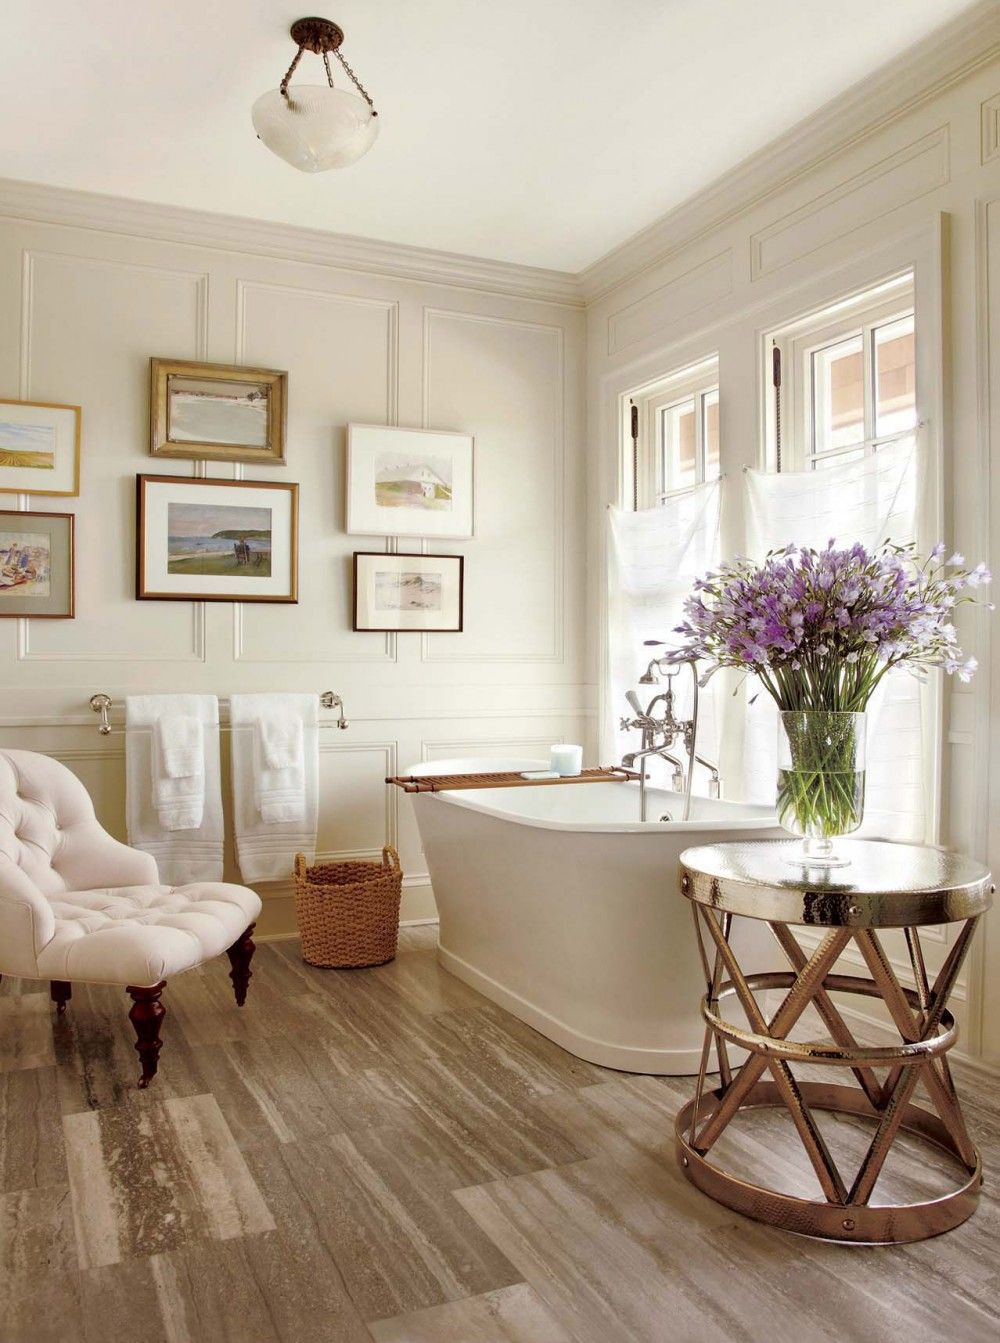 Chic and Cheap Spa-Style Bathroom Makeover | BATHROOM - 8X8 IDEAS ...